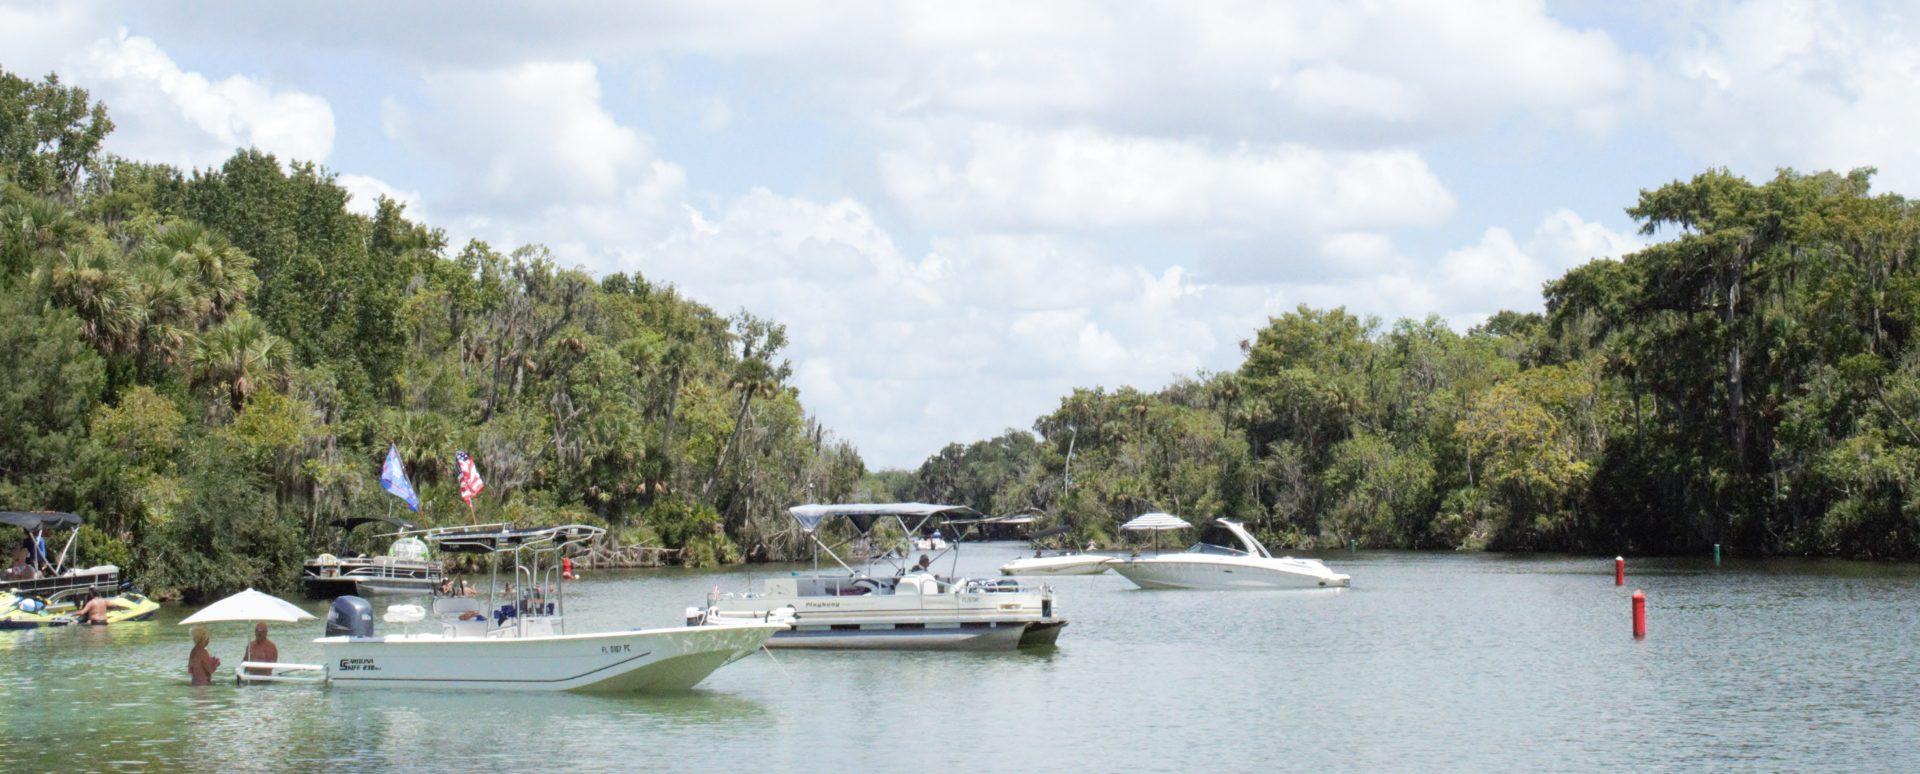 Central Florida Boating Destinations